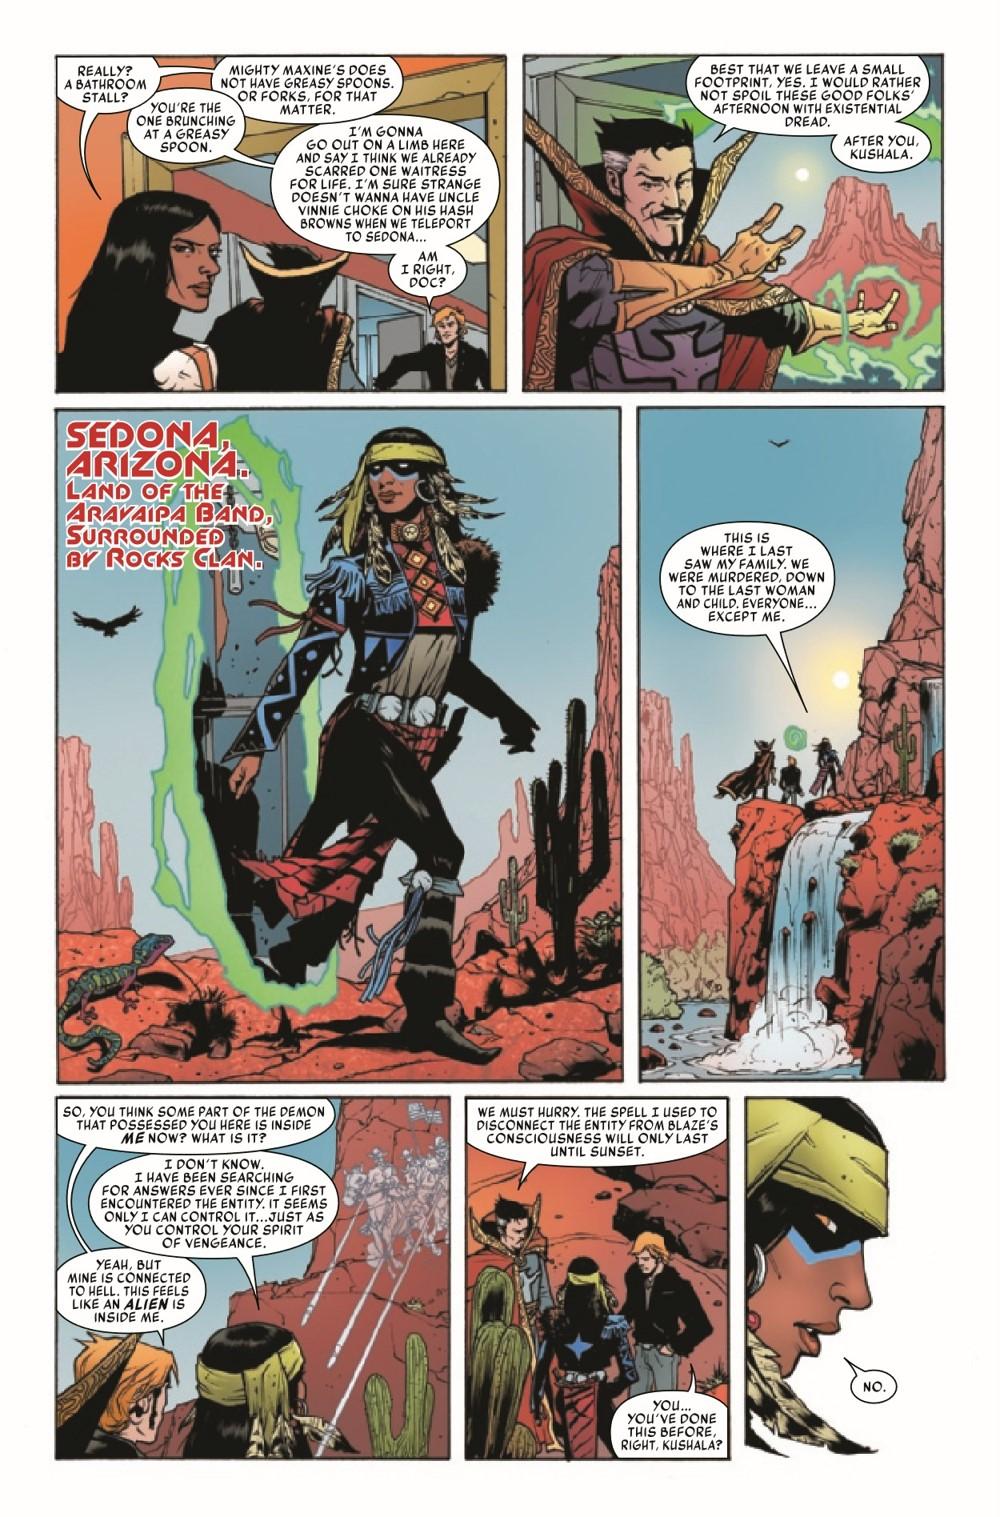 SOVSPRIDER2021001_Preview-5 ComicList Previews: SPIRITS OF VENGEANCE SPIRIT RIDER #1